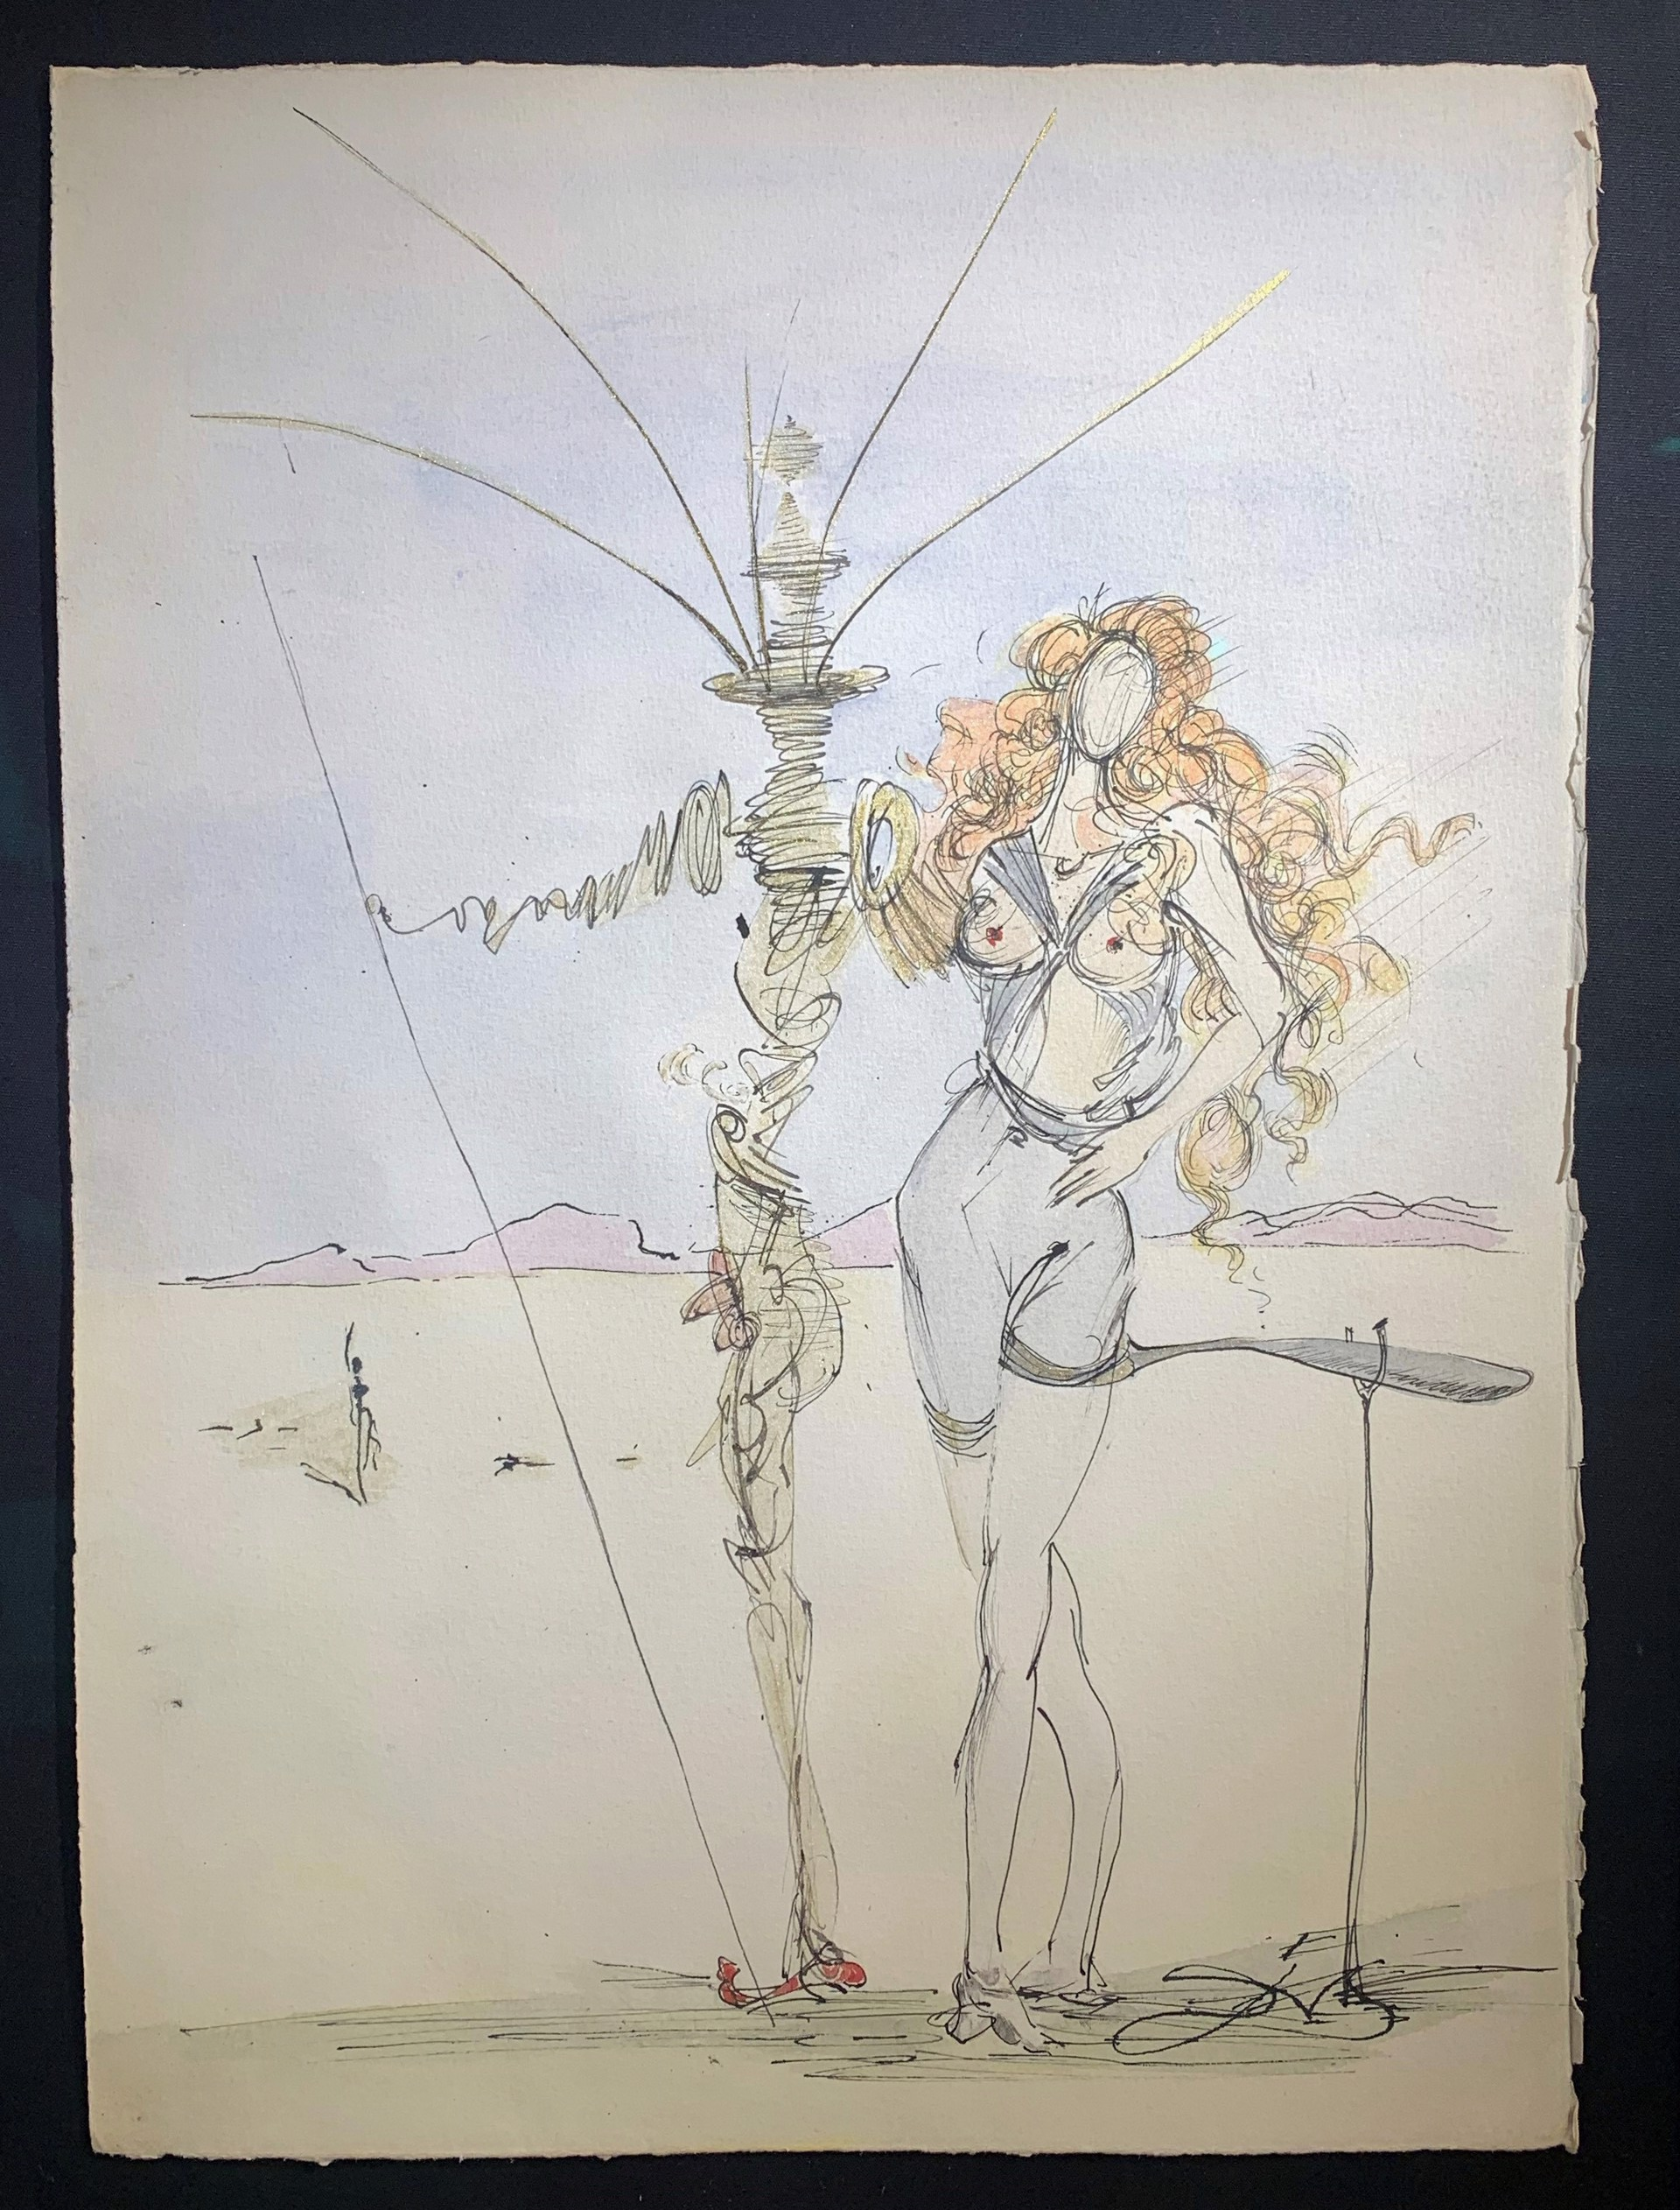 Salvador Dali La Femme aux Cheveux d'or et son Garde ink and watercolor with surrealist figures in center of composition